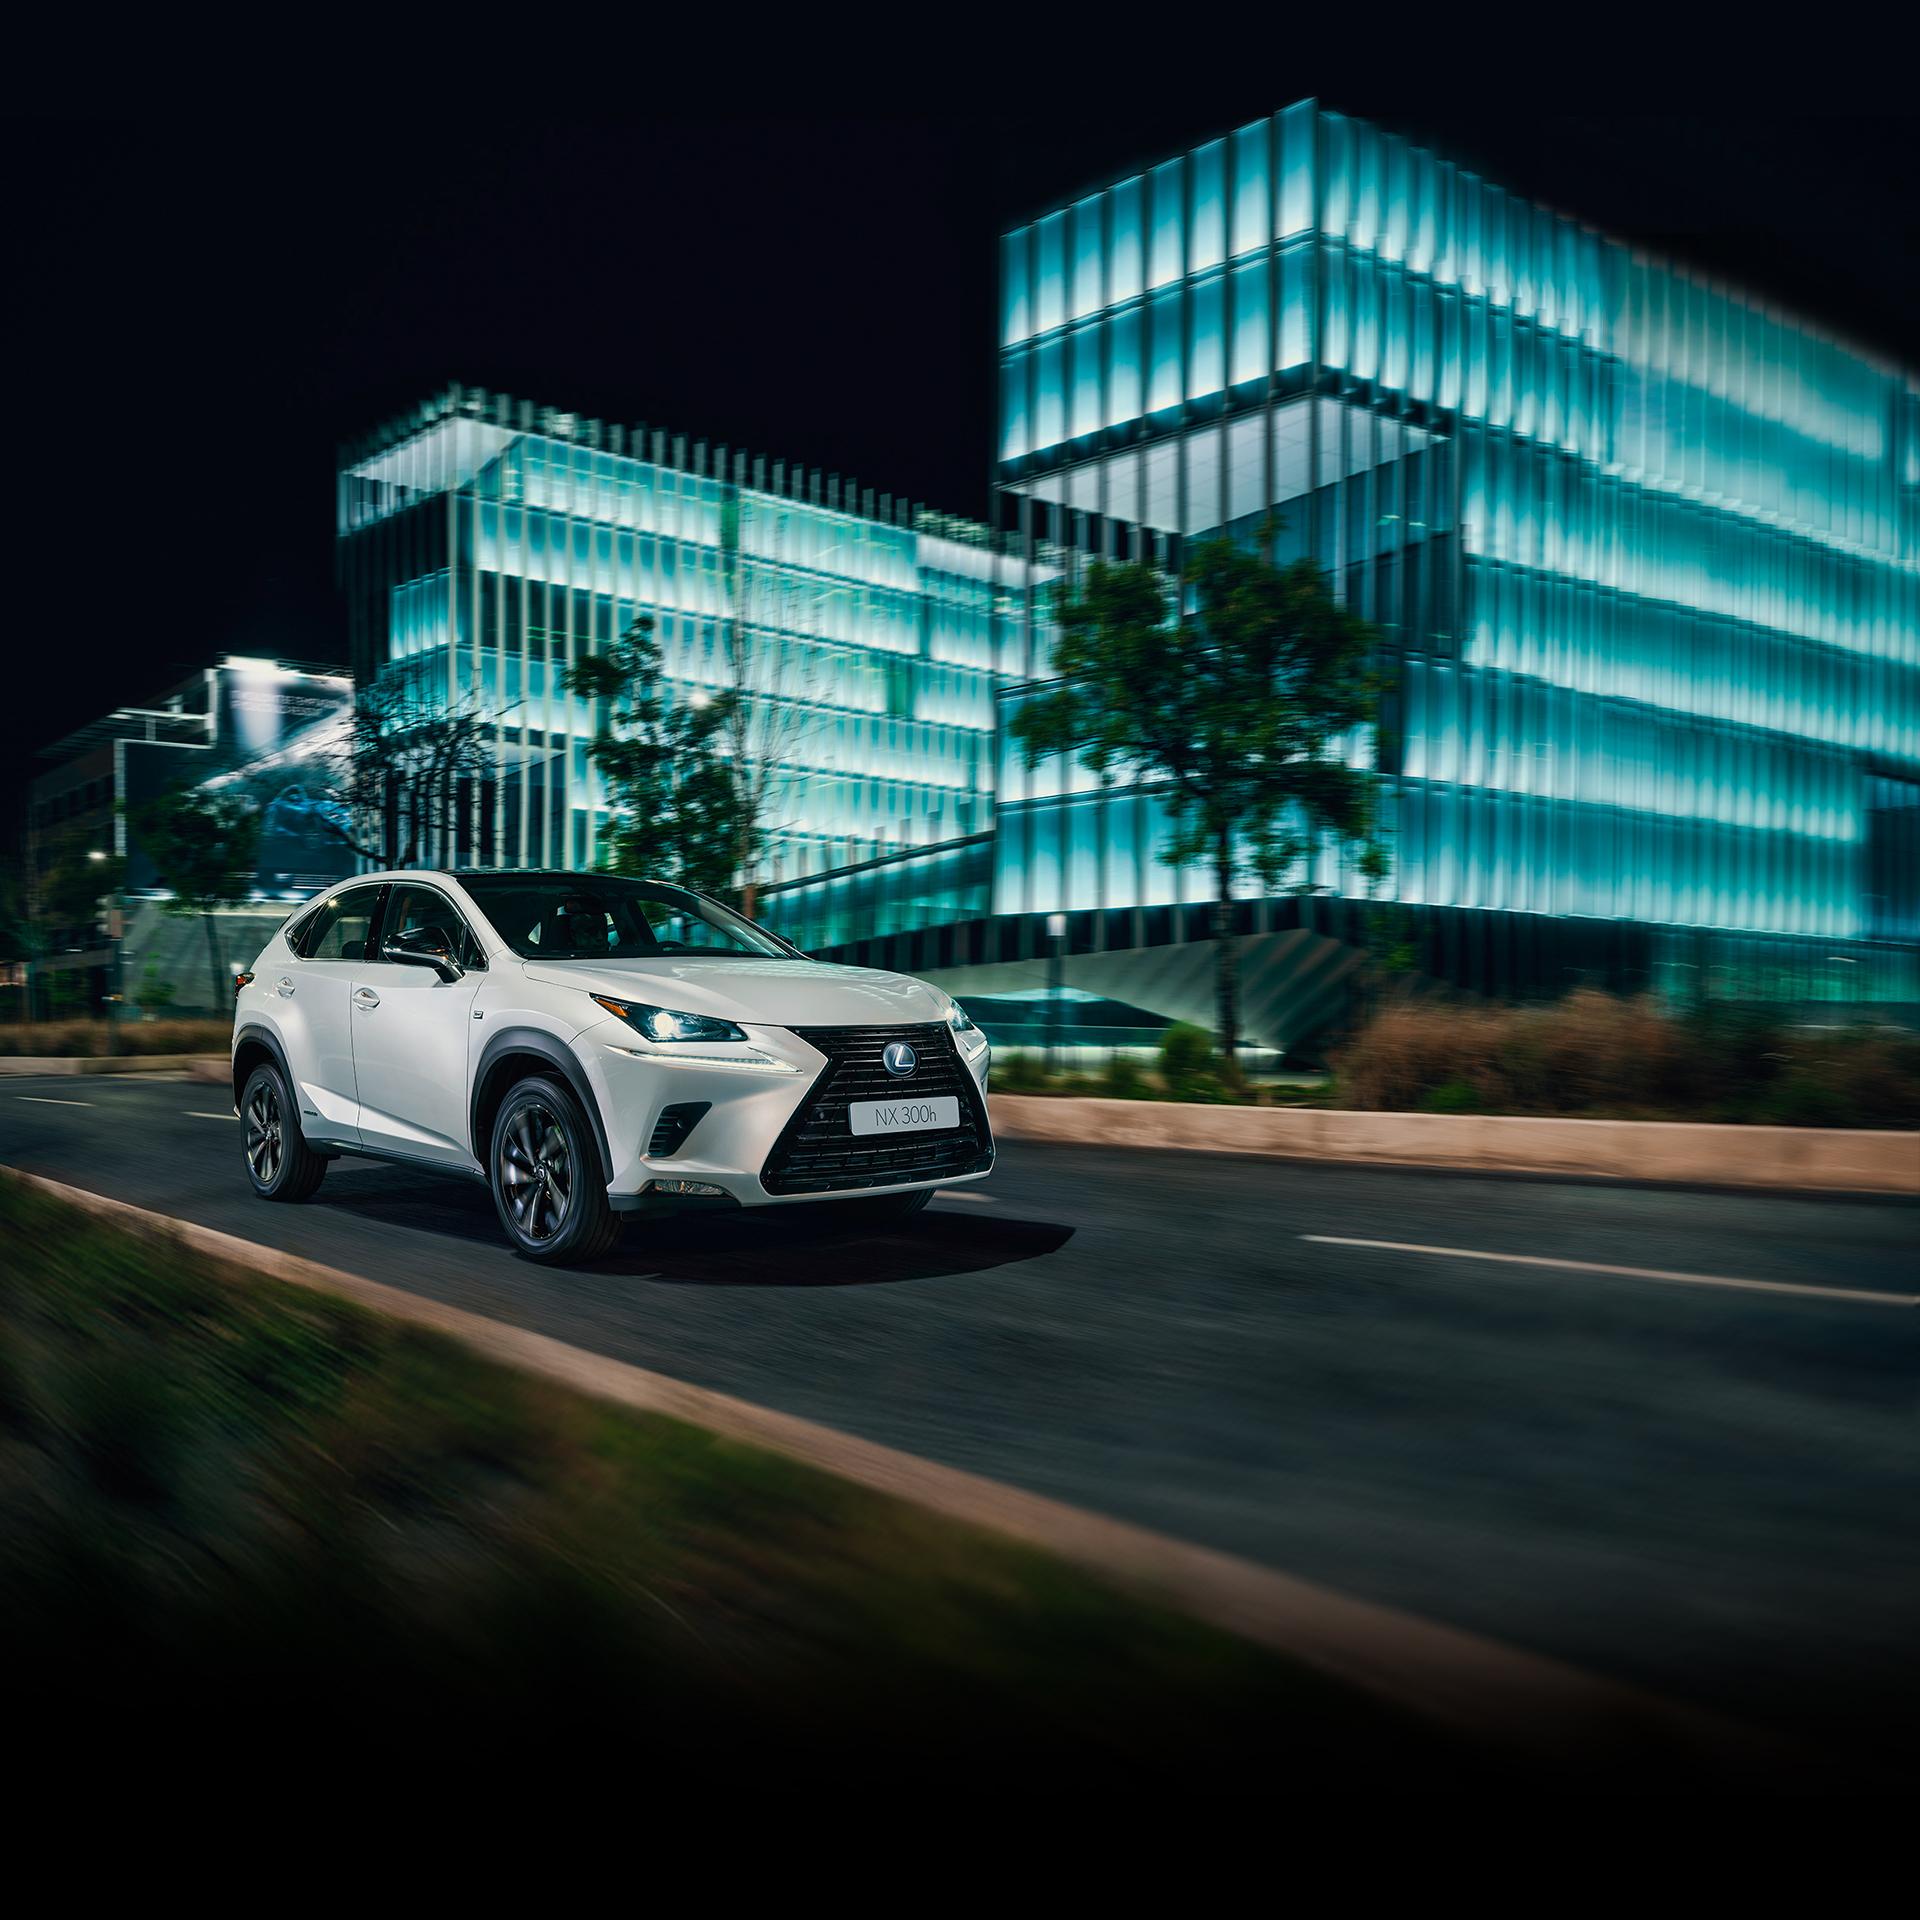 Ontdek De Hybride Lexus NX 300h Crossover